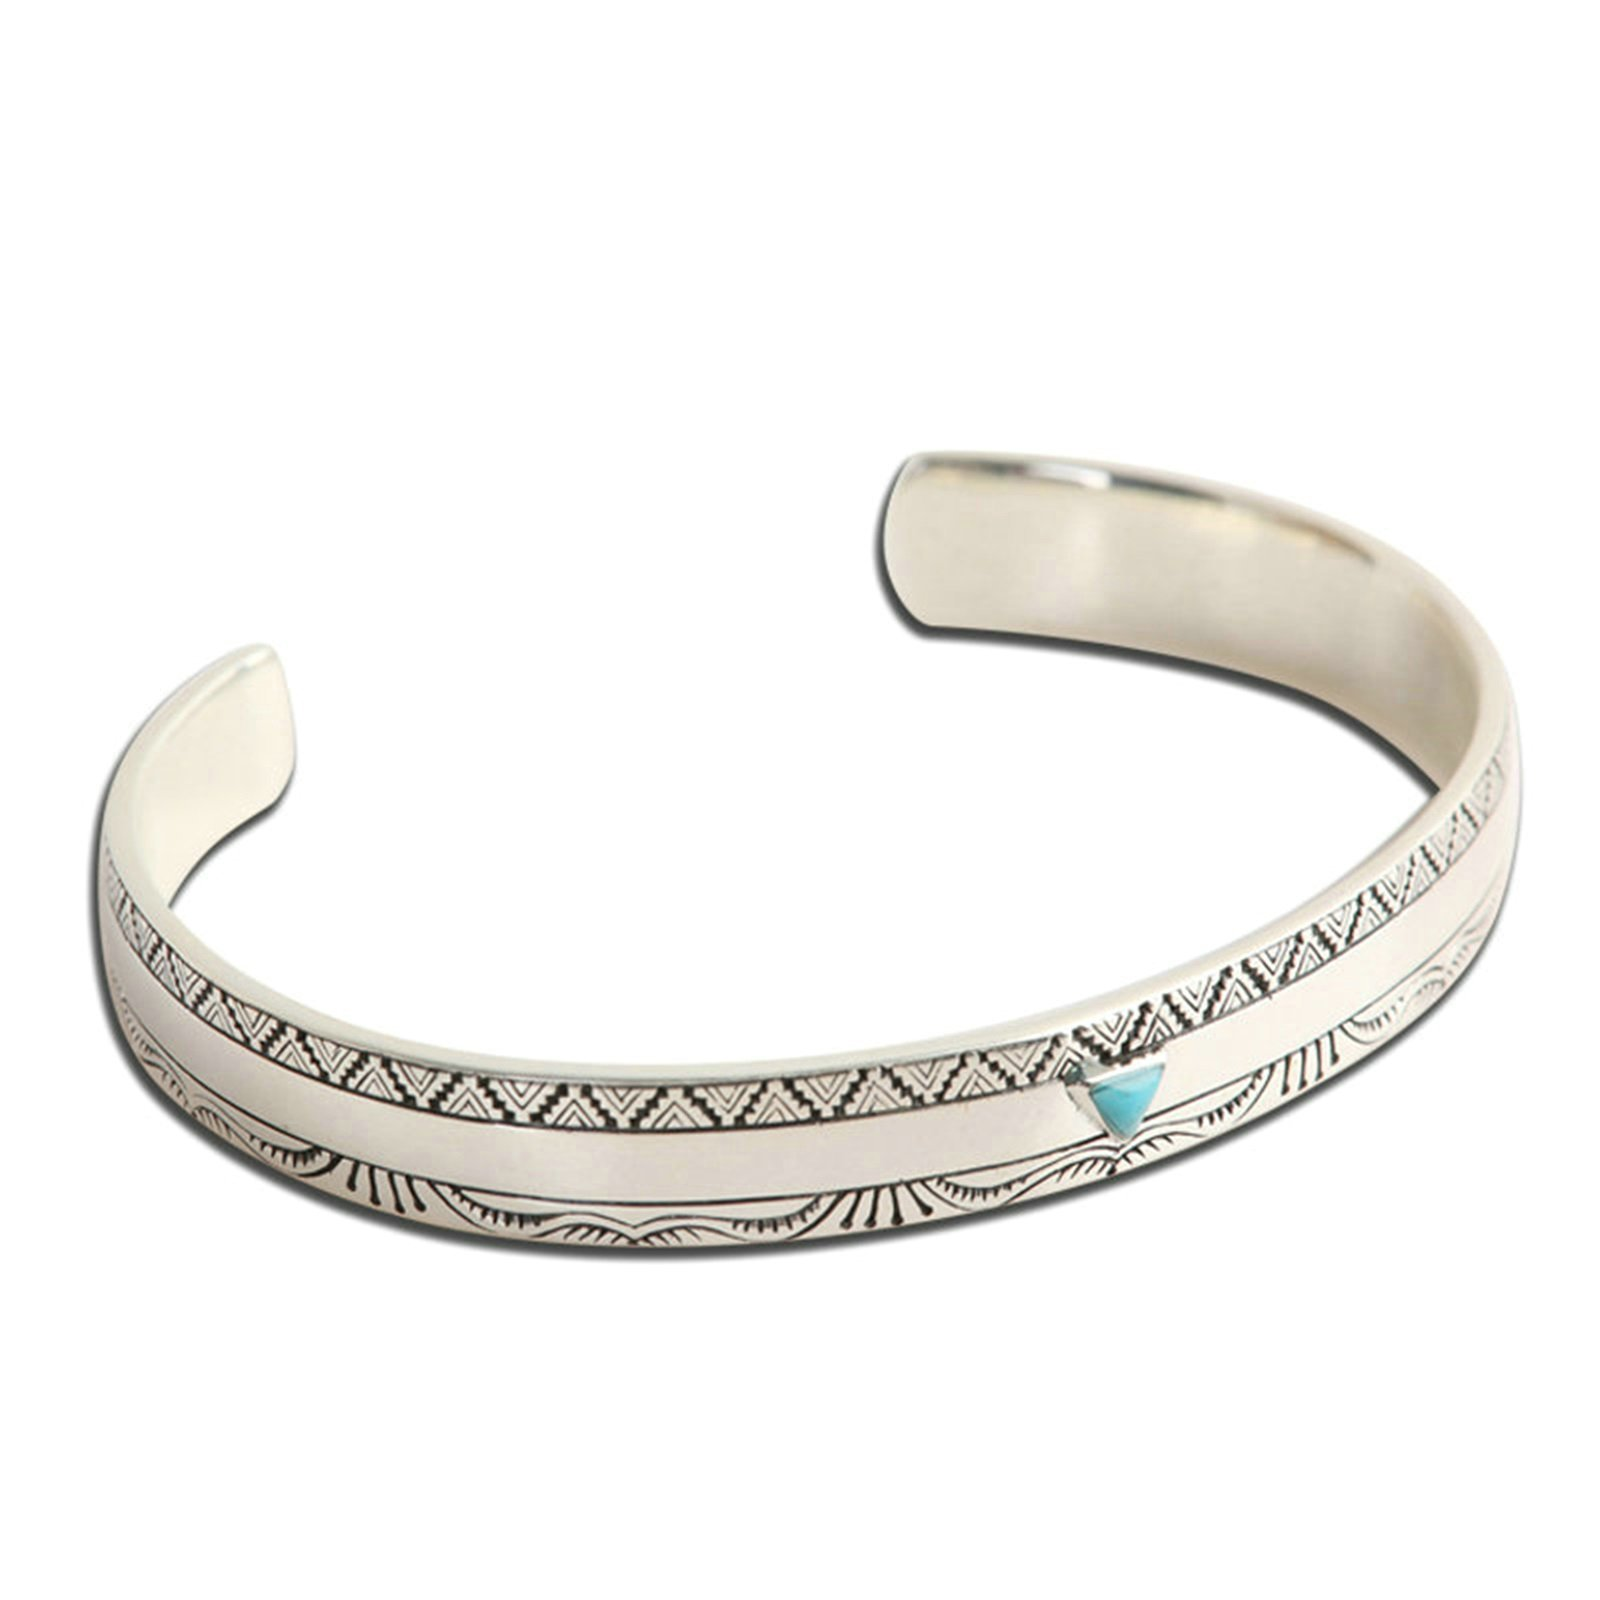 Daesar 925 Silver Bracelet For Men Engraving Triangle Opening Bracelet Silver